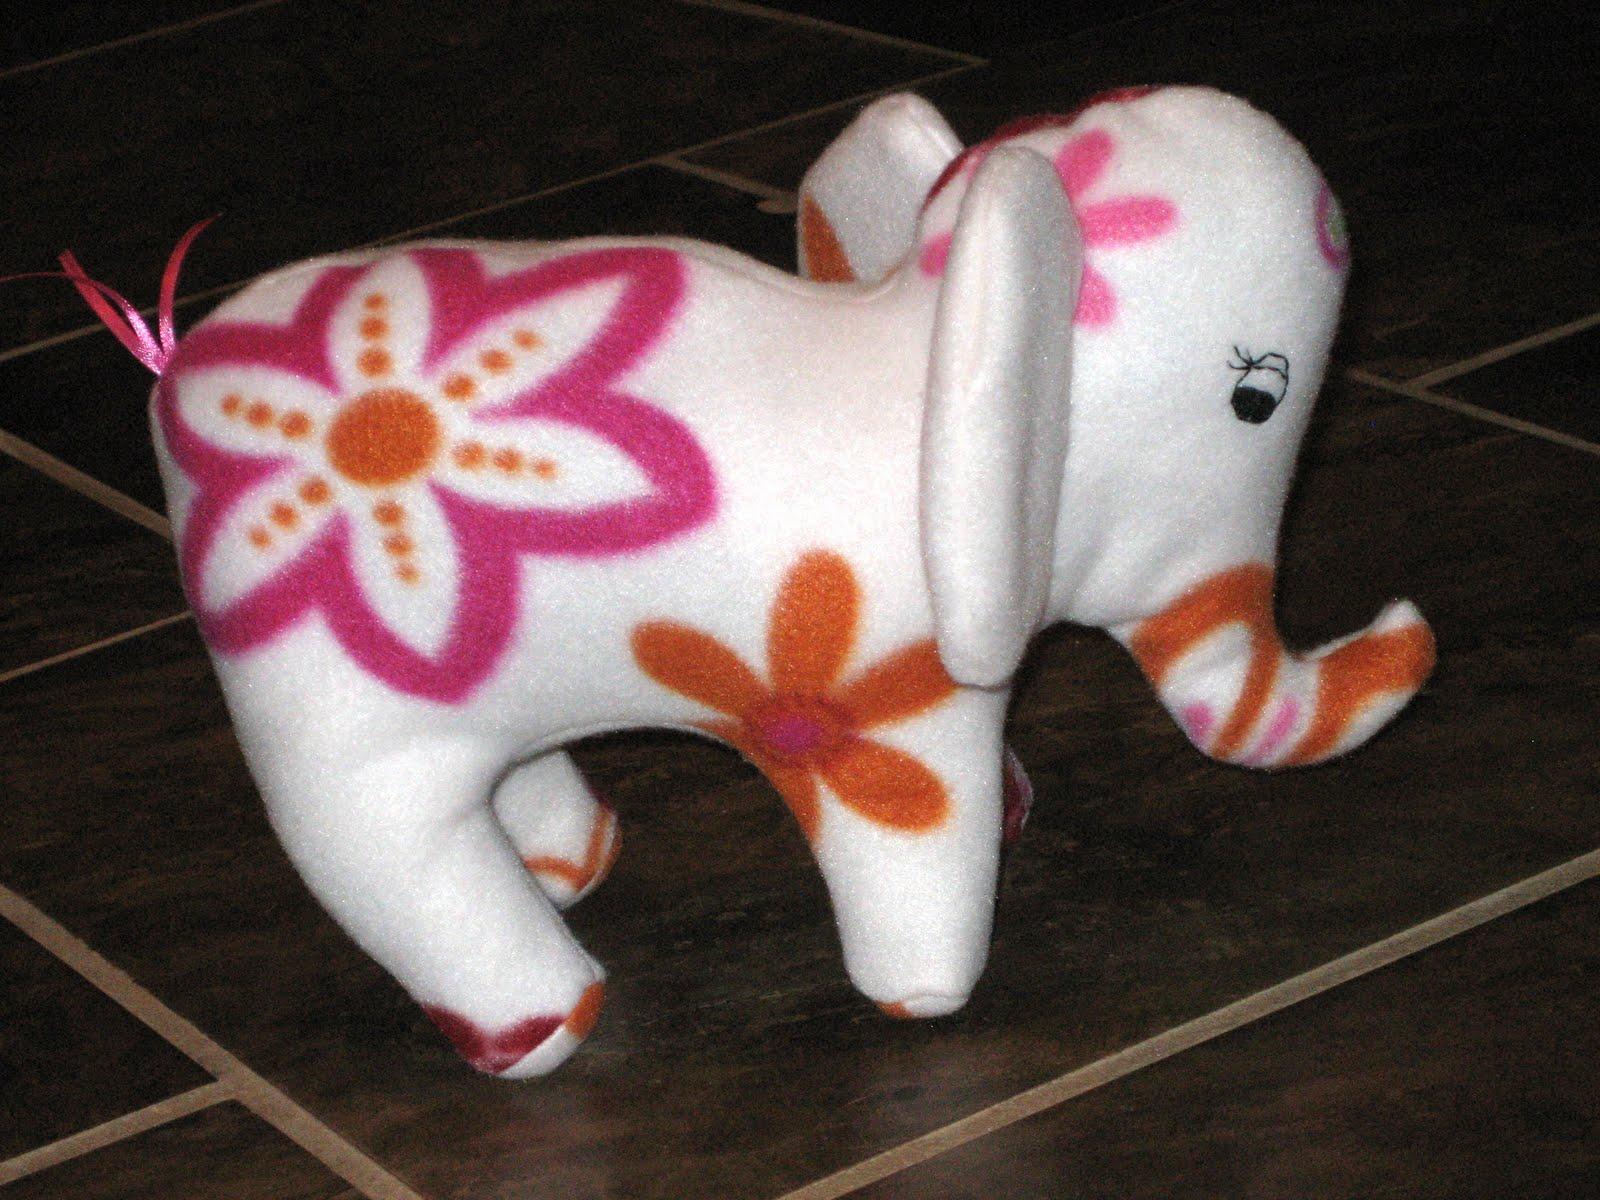 Jill made it stuffed animal elephants stuffed animal elephants jeuxipadfo Gallery